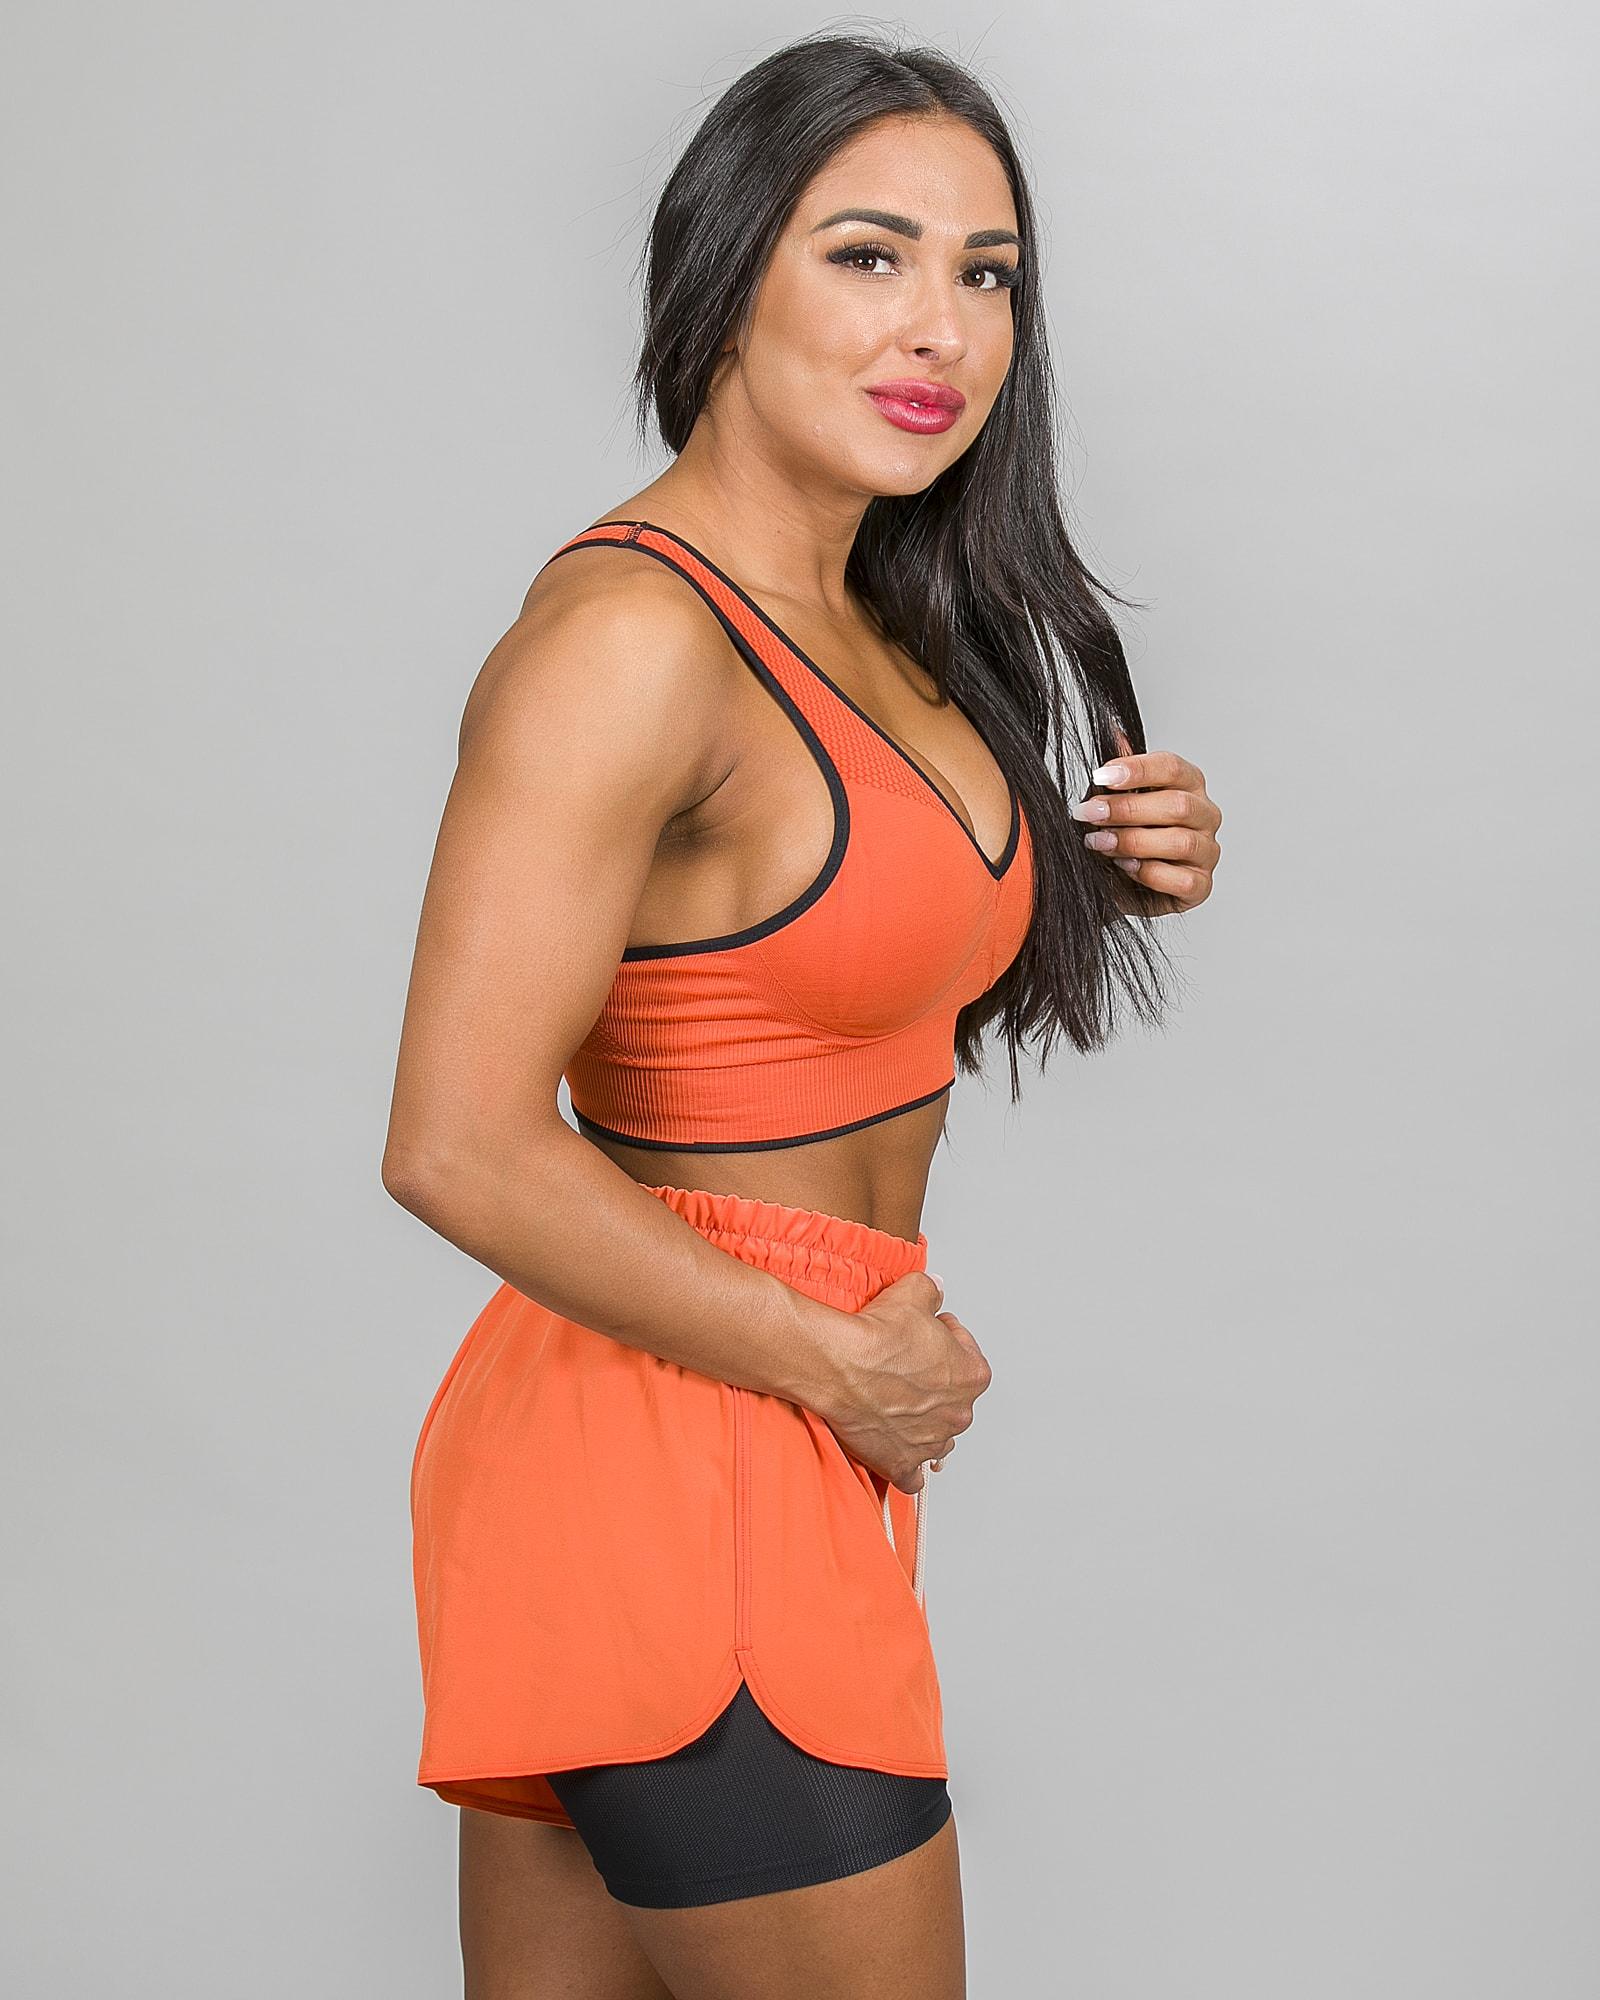 Skiny SK86 Shorts 083111and Crop Top 083094- Blazing Orange k